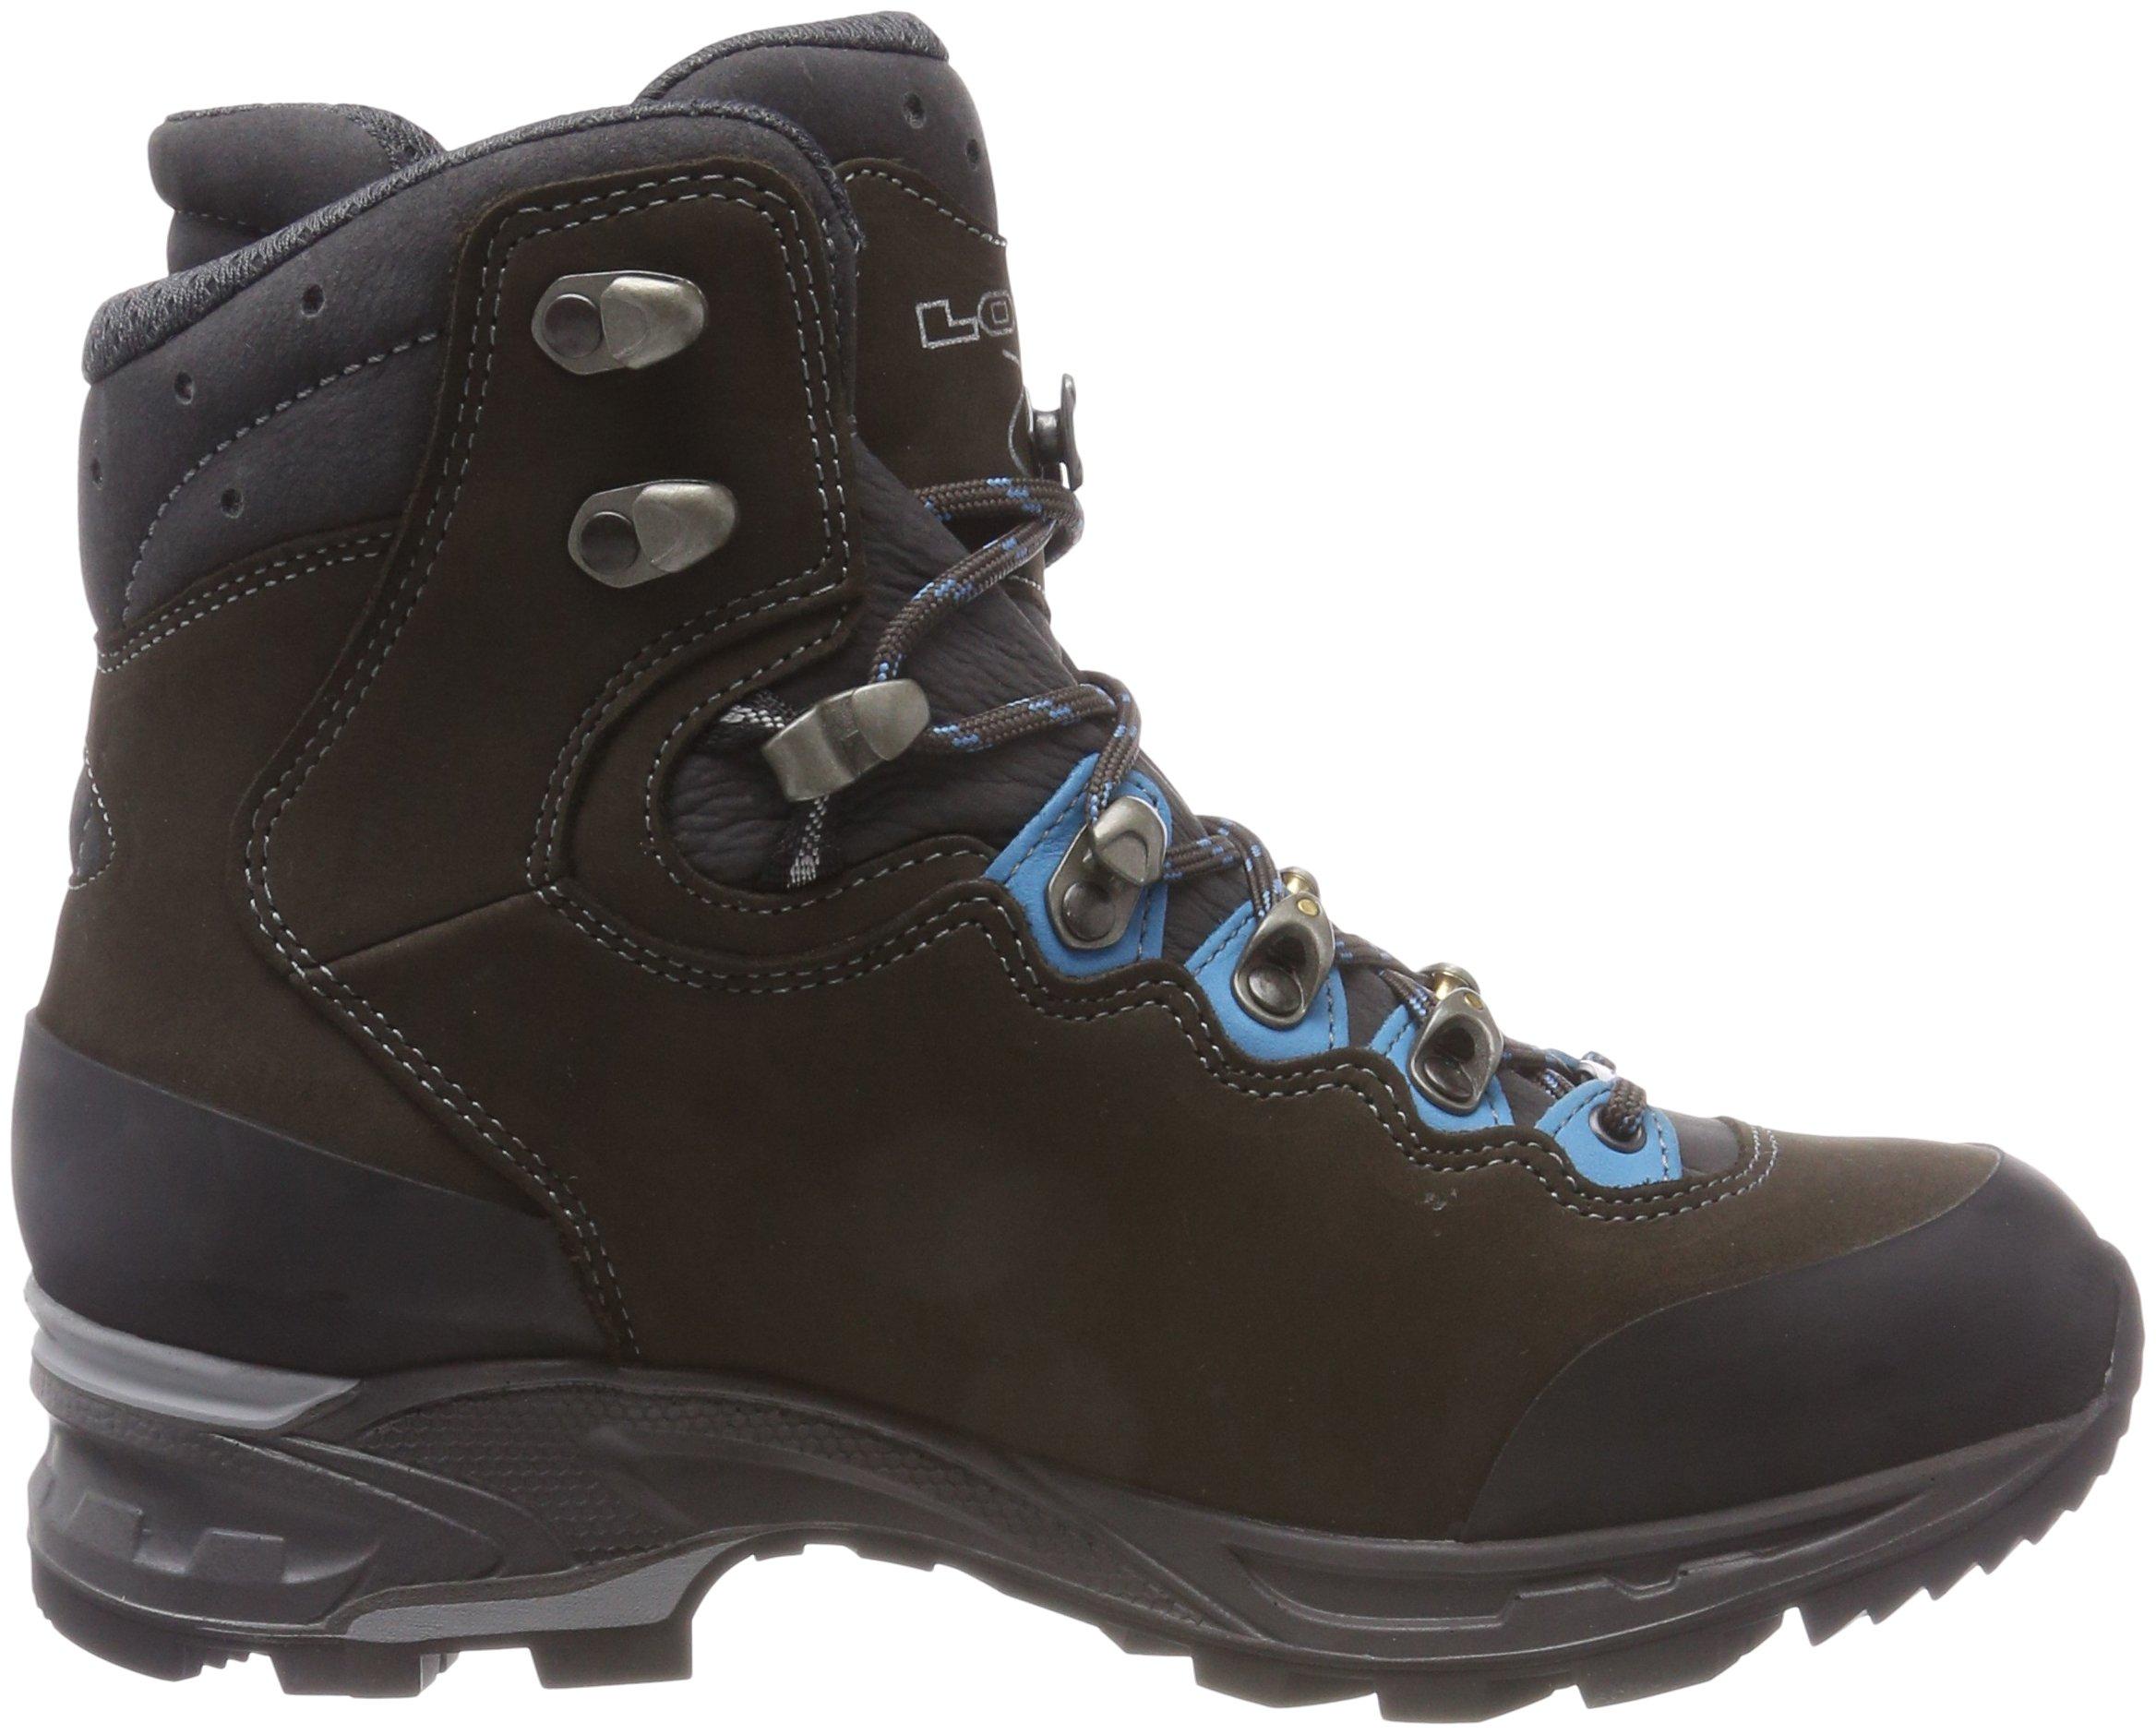 81J%2BmgRGtcL - Lowa Women's Mauria GTX Ws High Rise Hiking Boots